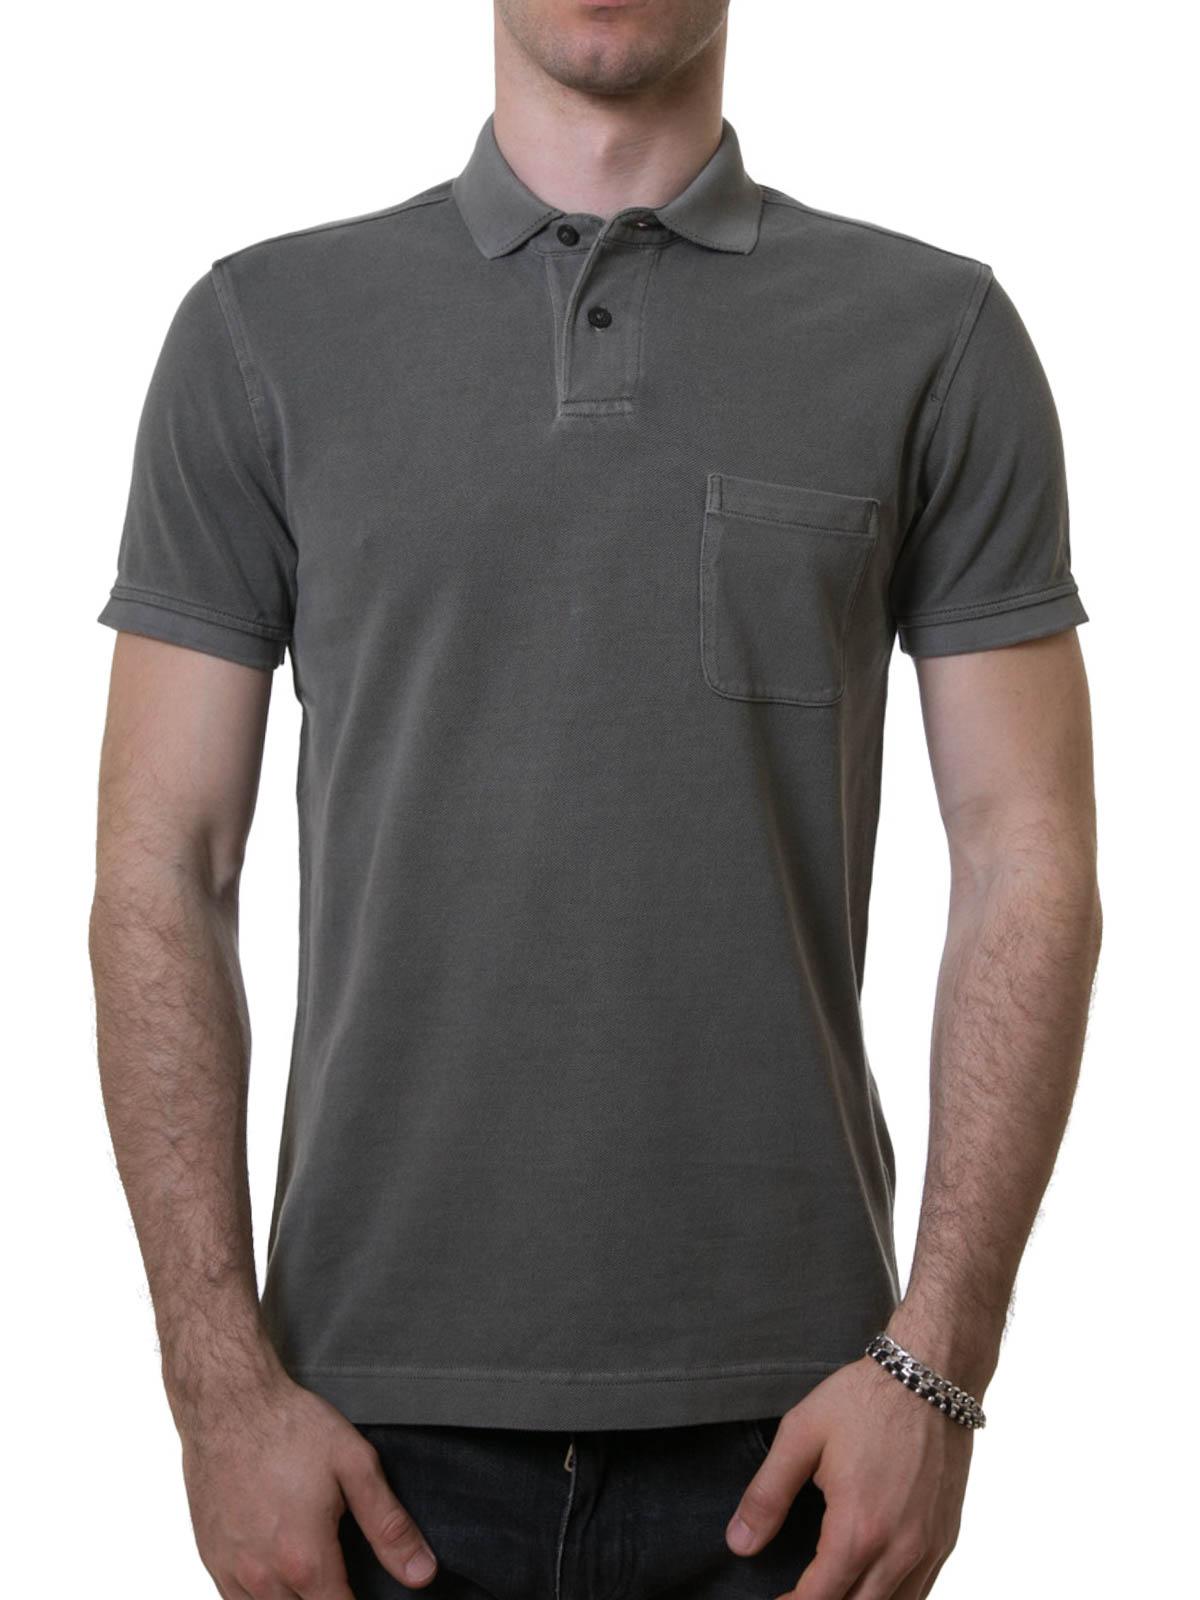 10350a2780275 Buy Zegna Z Zegna Polo Shirt grey and blue stripe pique design  Style.476340501 ipndso37xtoA.